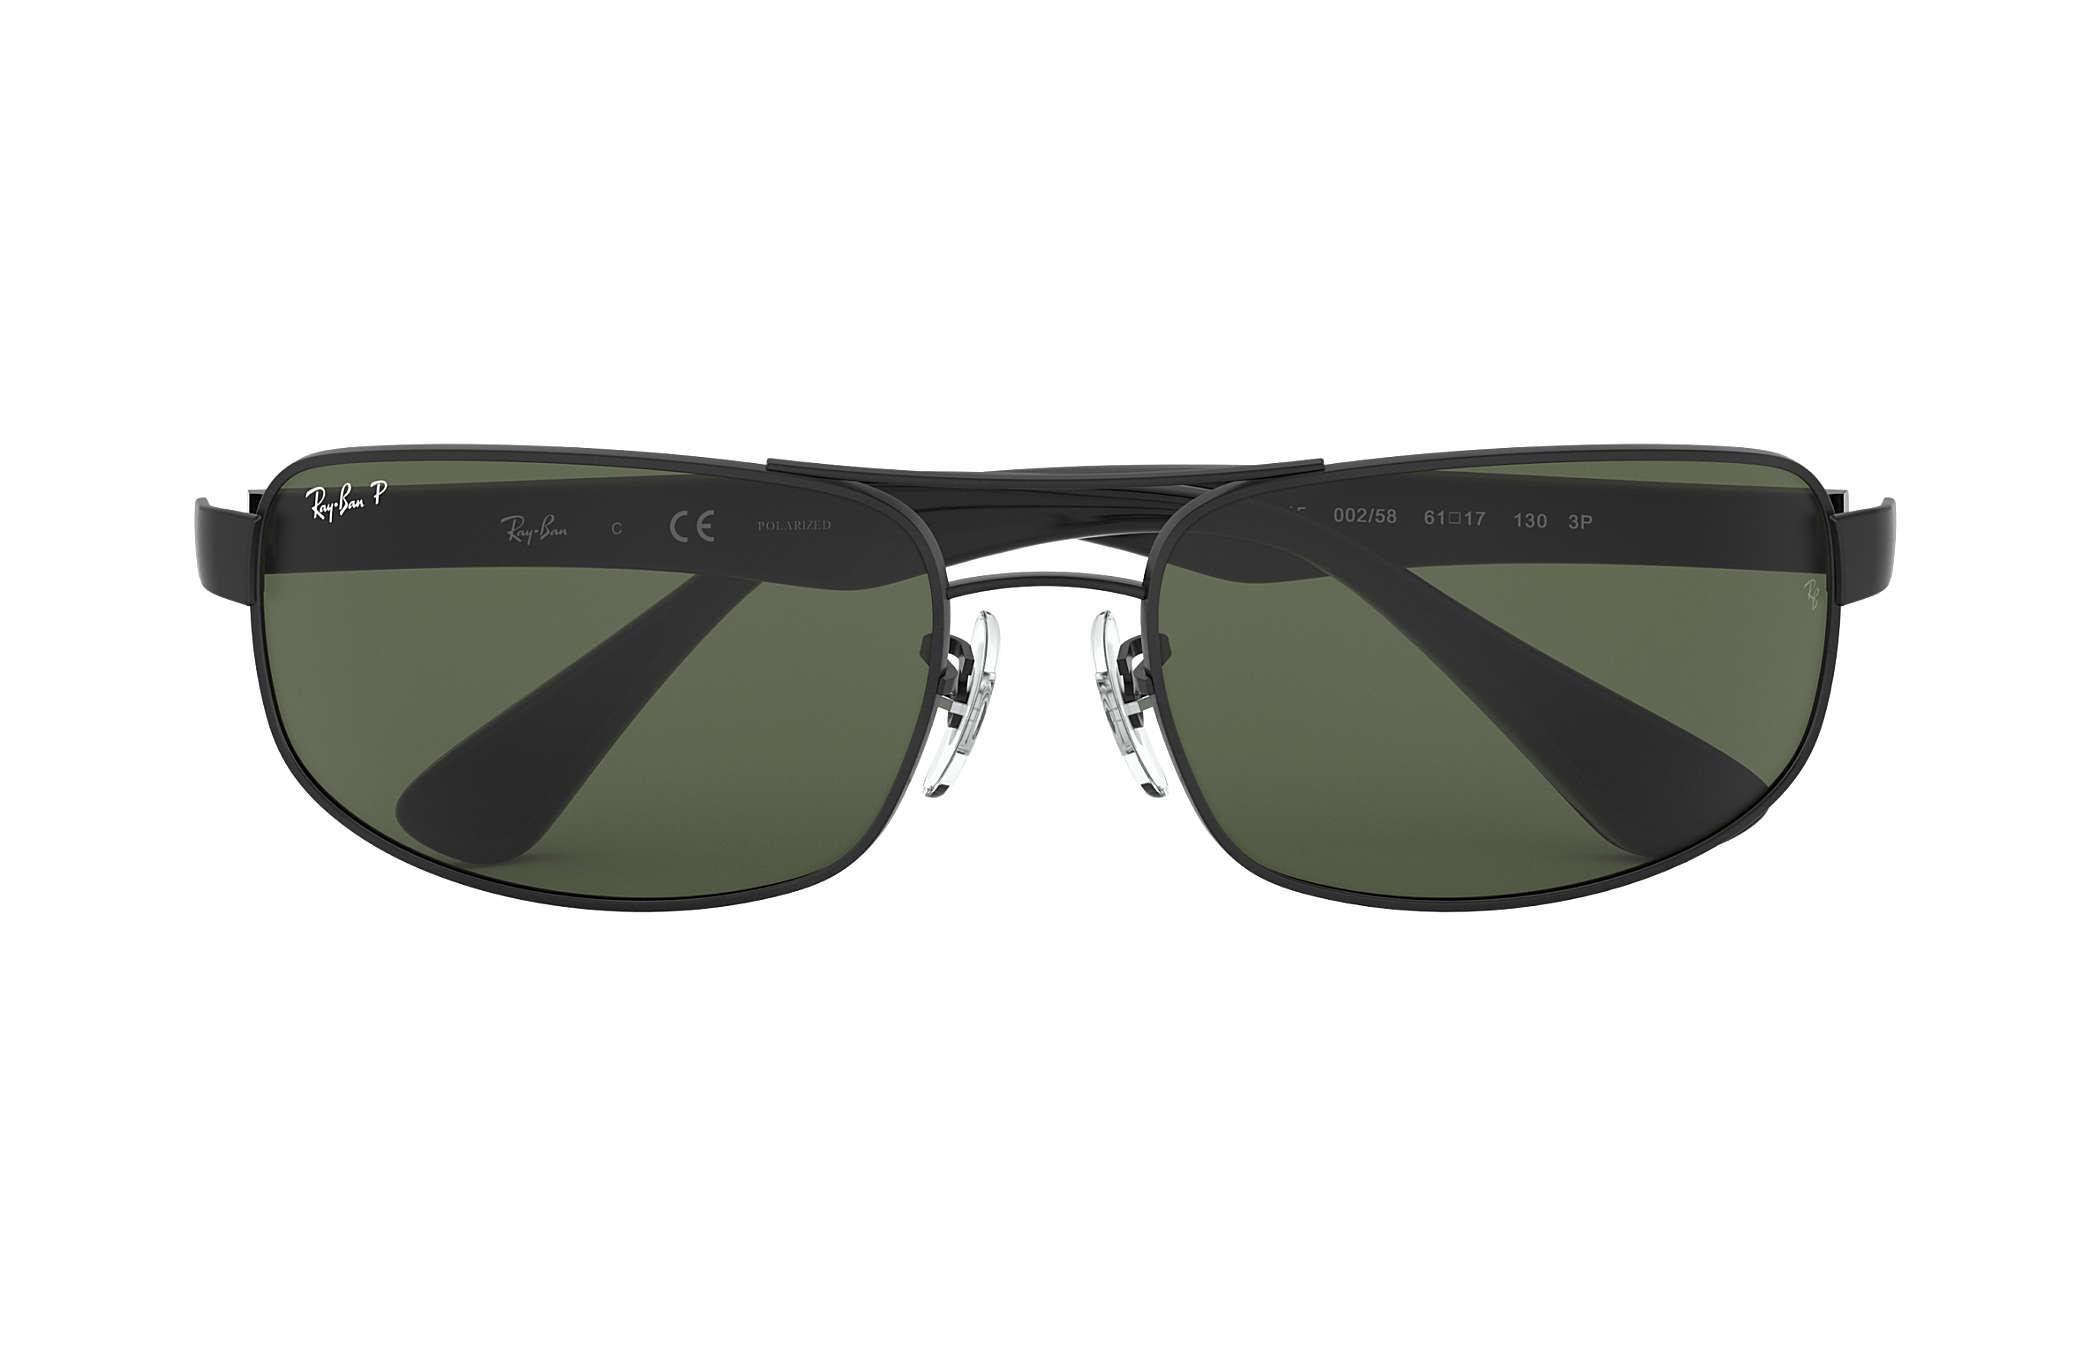 3c38baaa434 Ray-Ban RB3445 Black - Metal - Green Polarized Lenses - 0RB3445002 ...